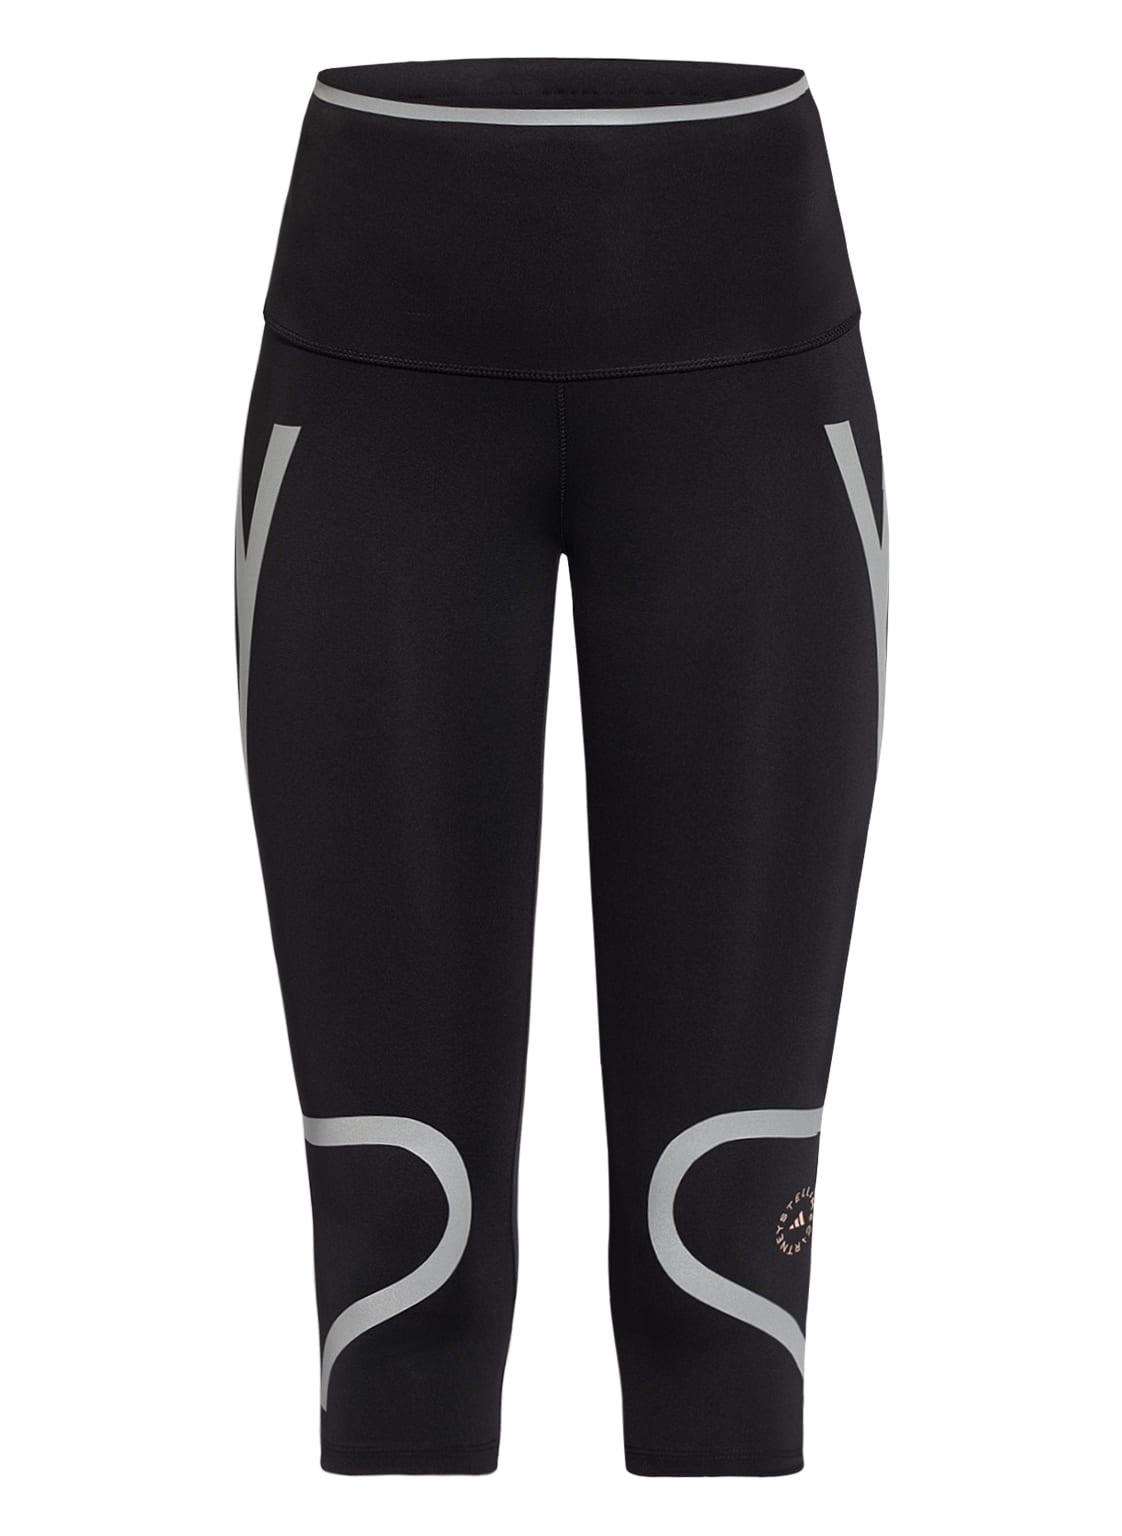 Image of Adidas By Stella Mccartney 3/4-Tights Truepace Heat.Rdy Running Primeblue schwarz